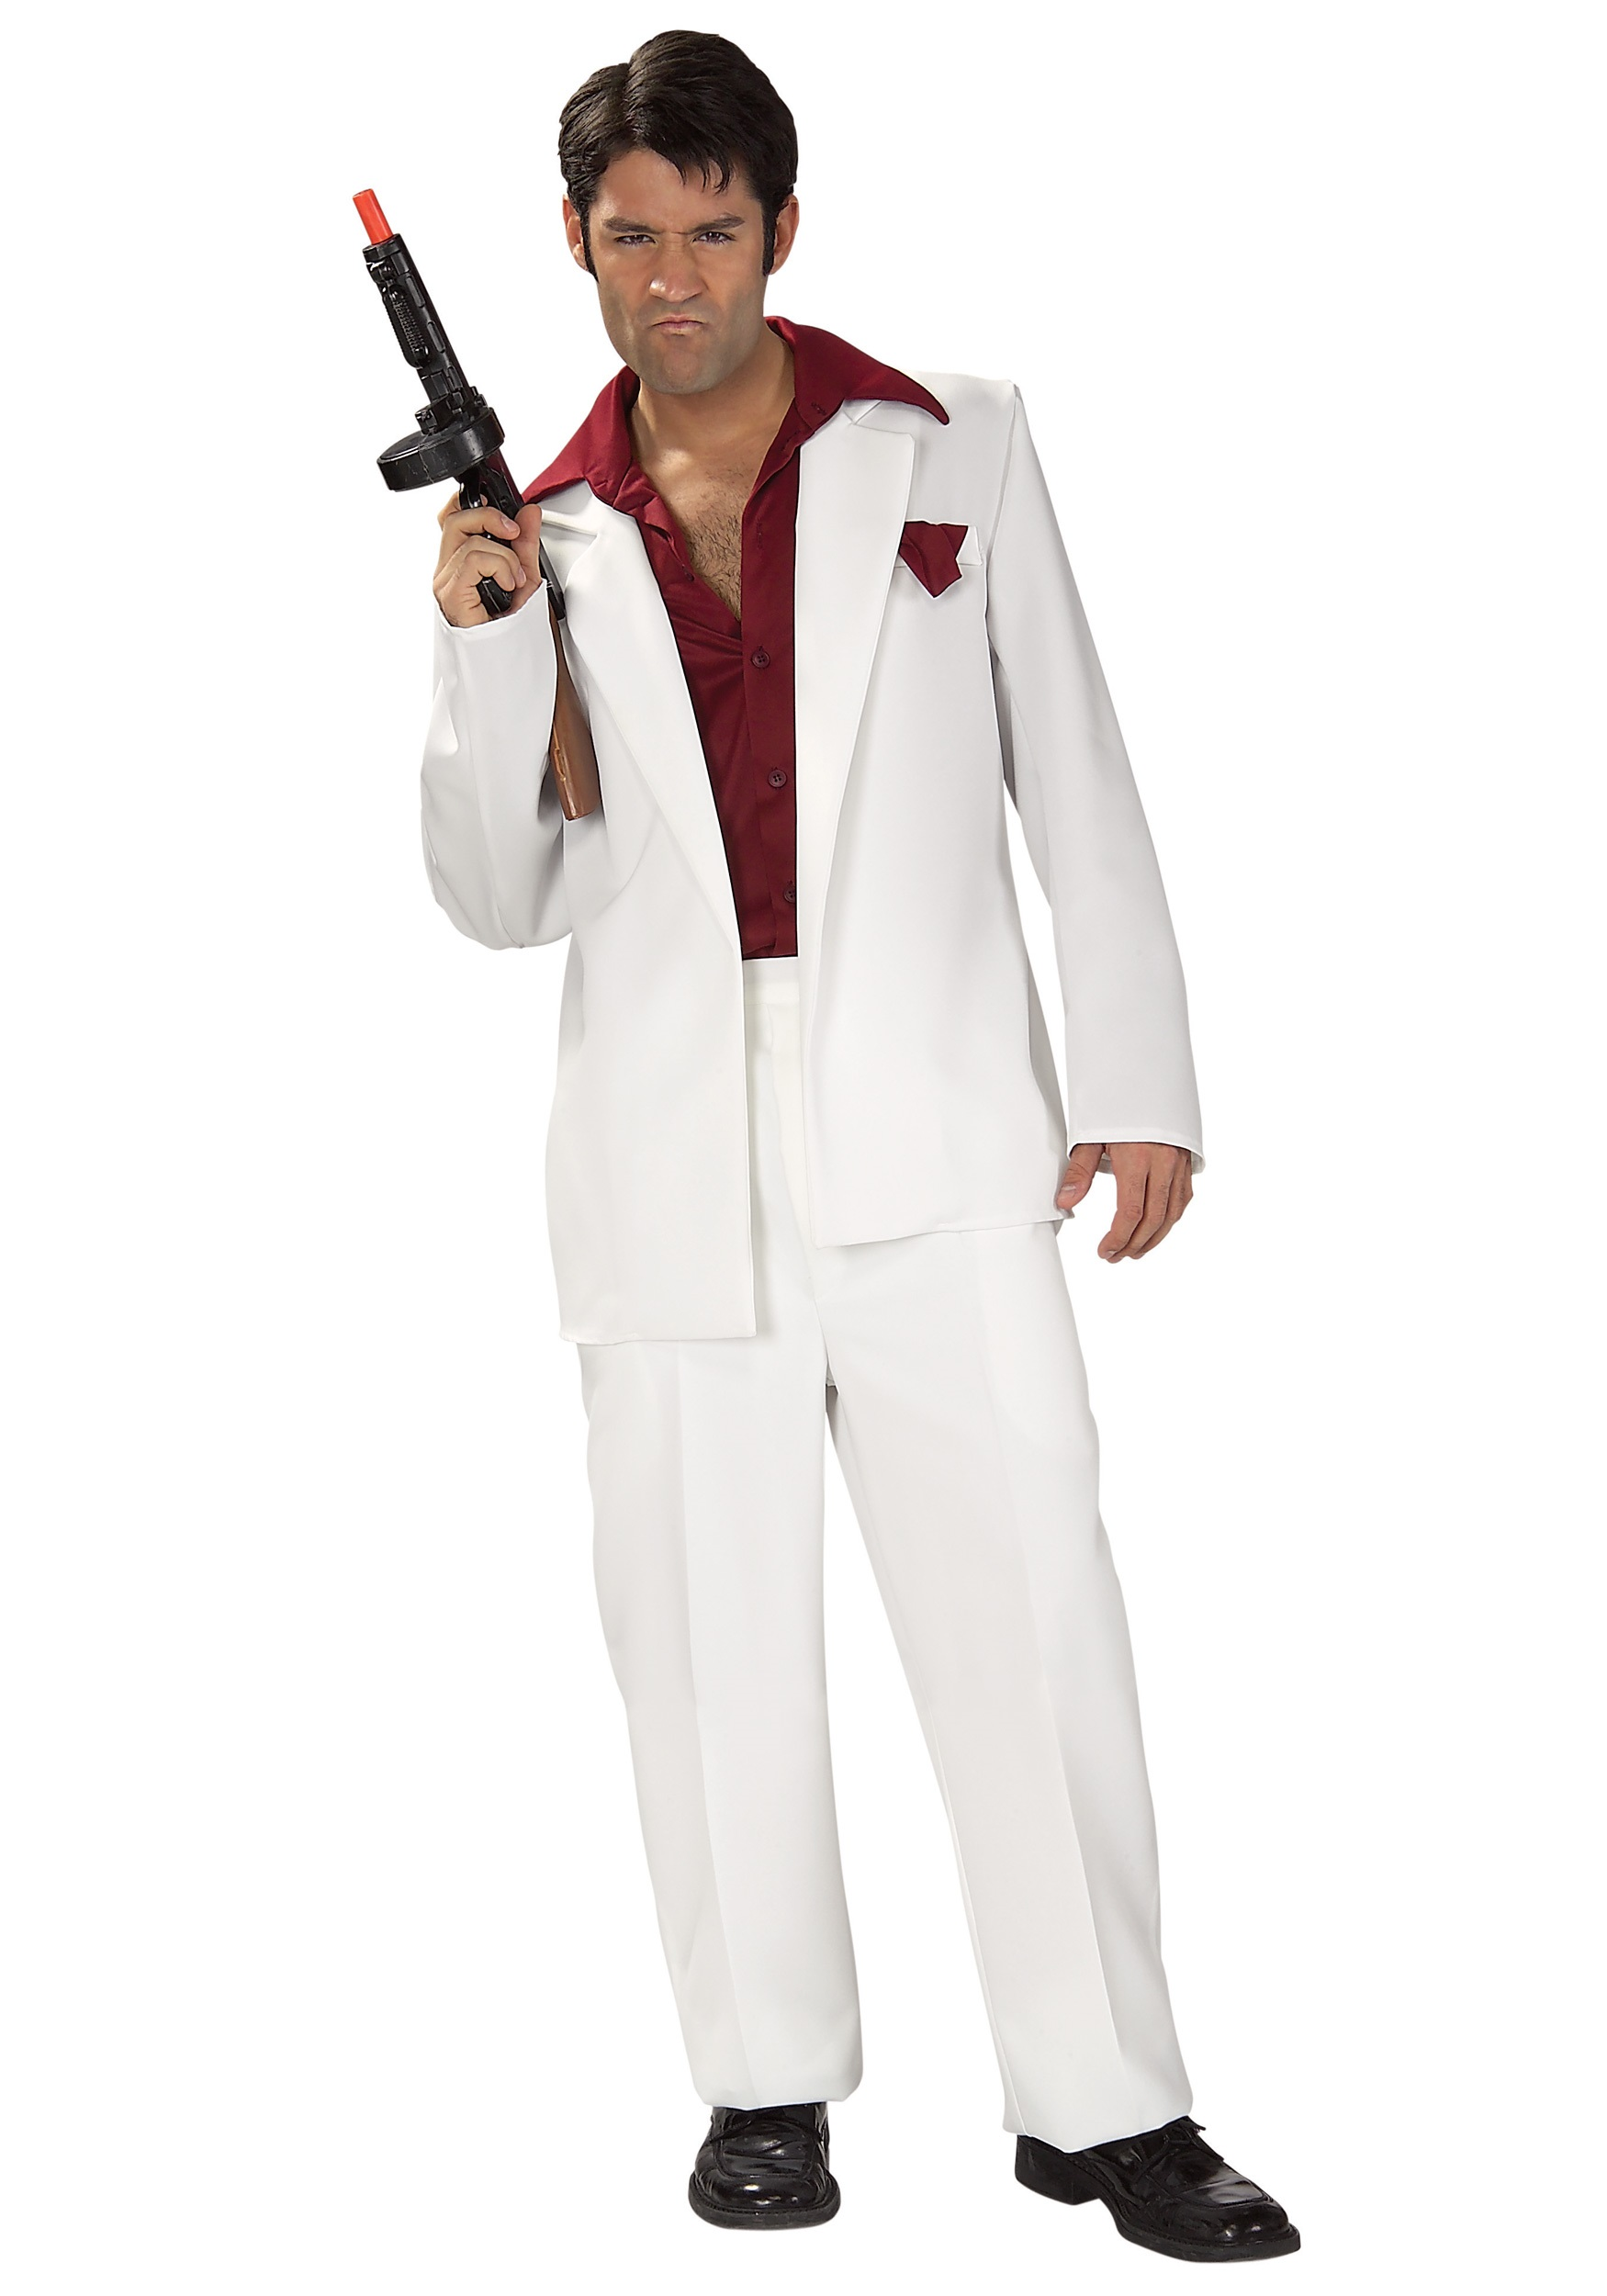 Scarface Movie Costume  sc 1 st  Halloween Costumes & Scarface Movie Costume - Halloween Costumes